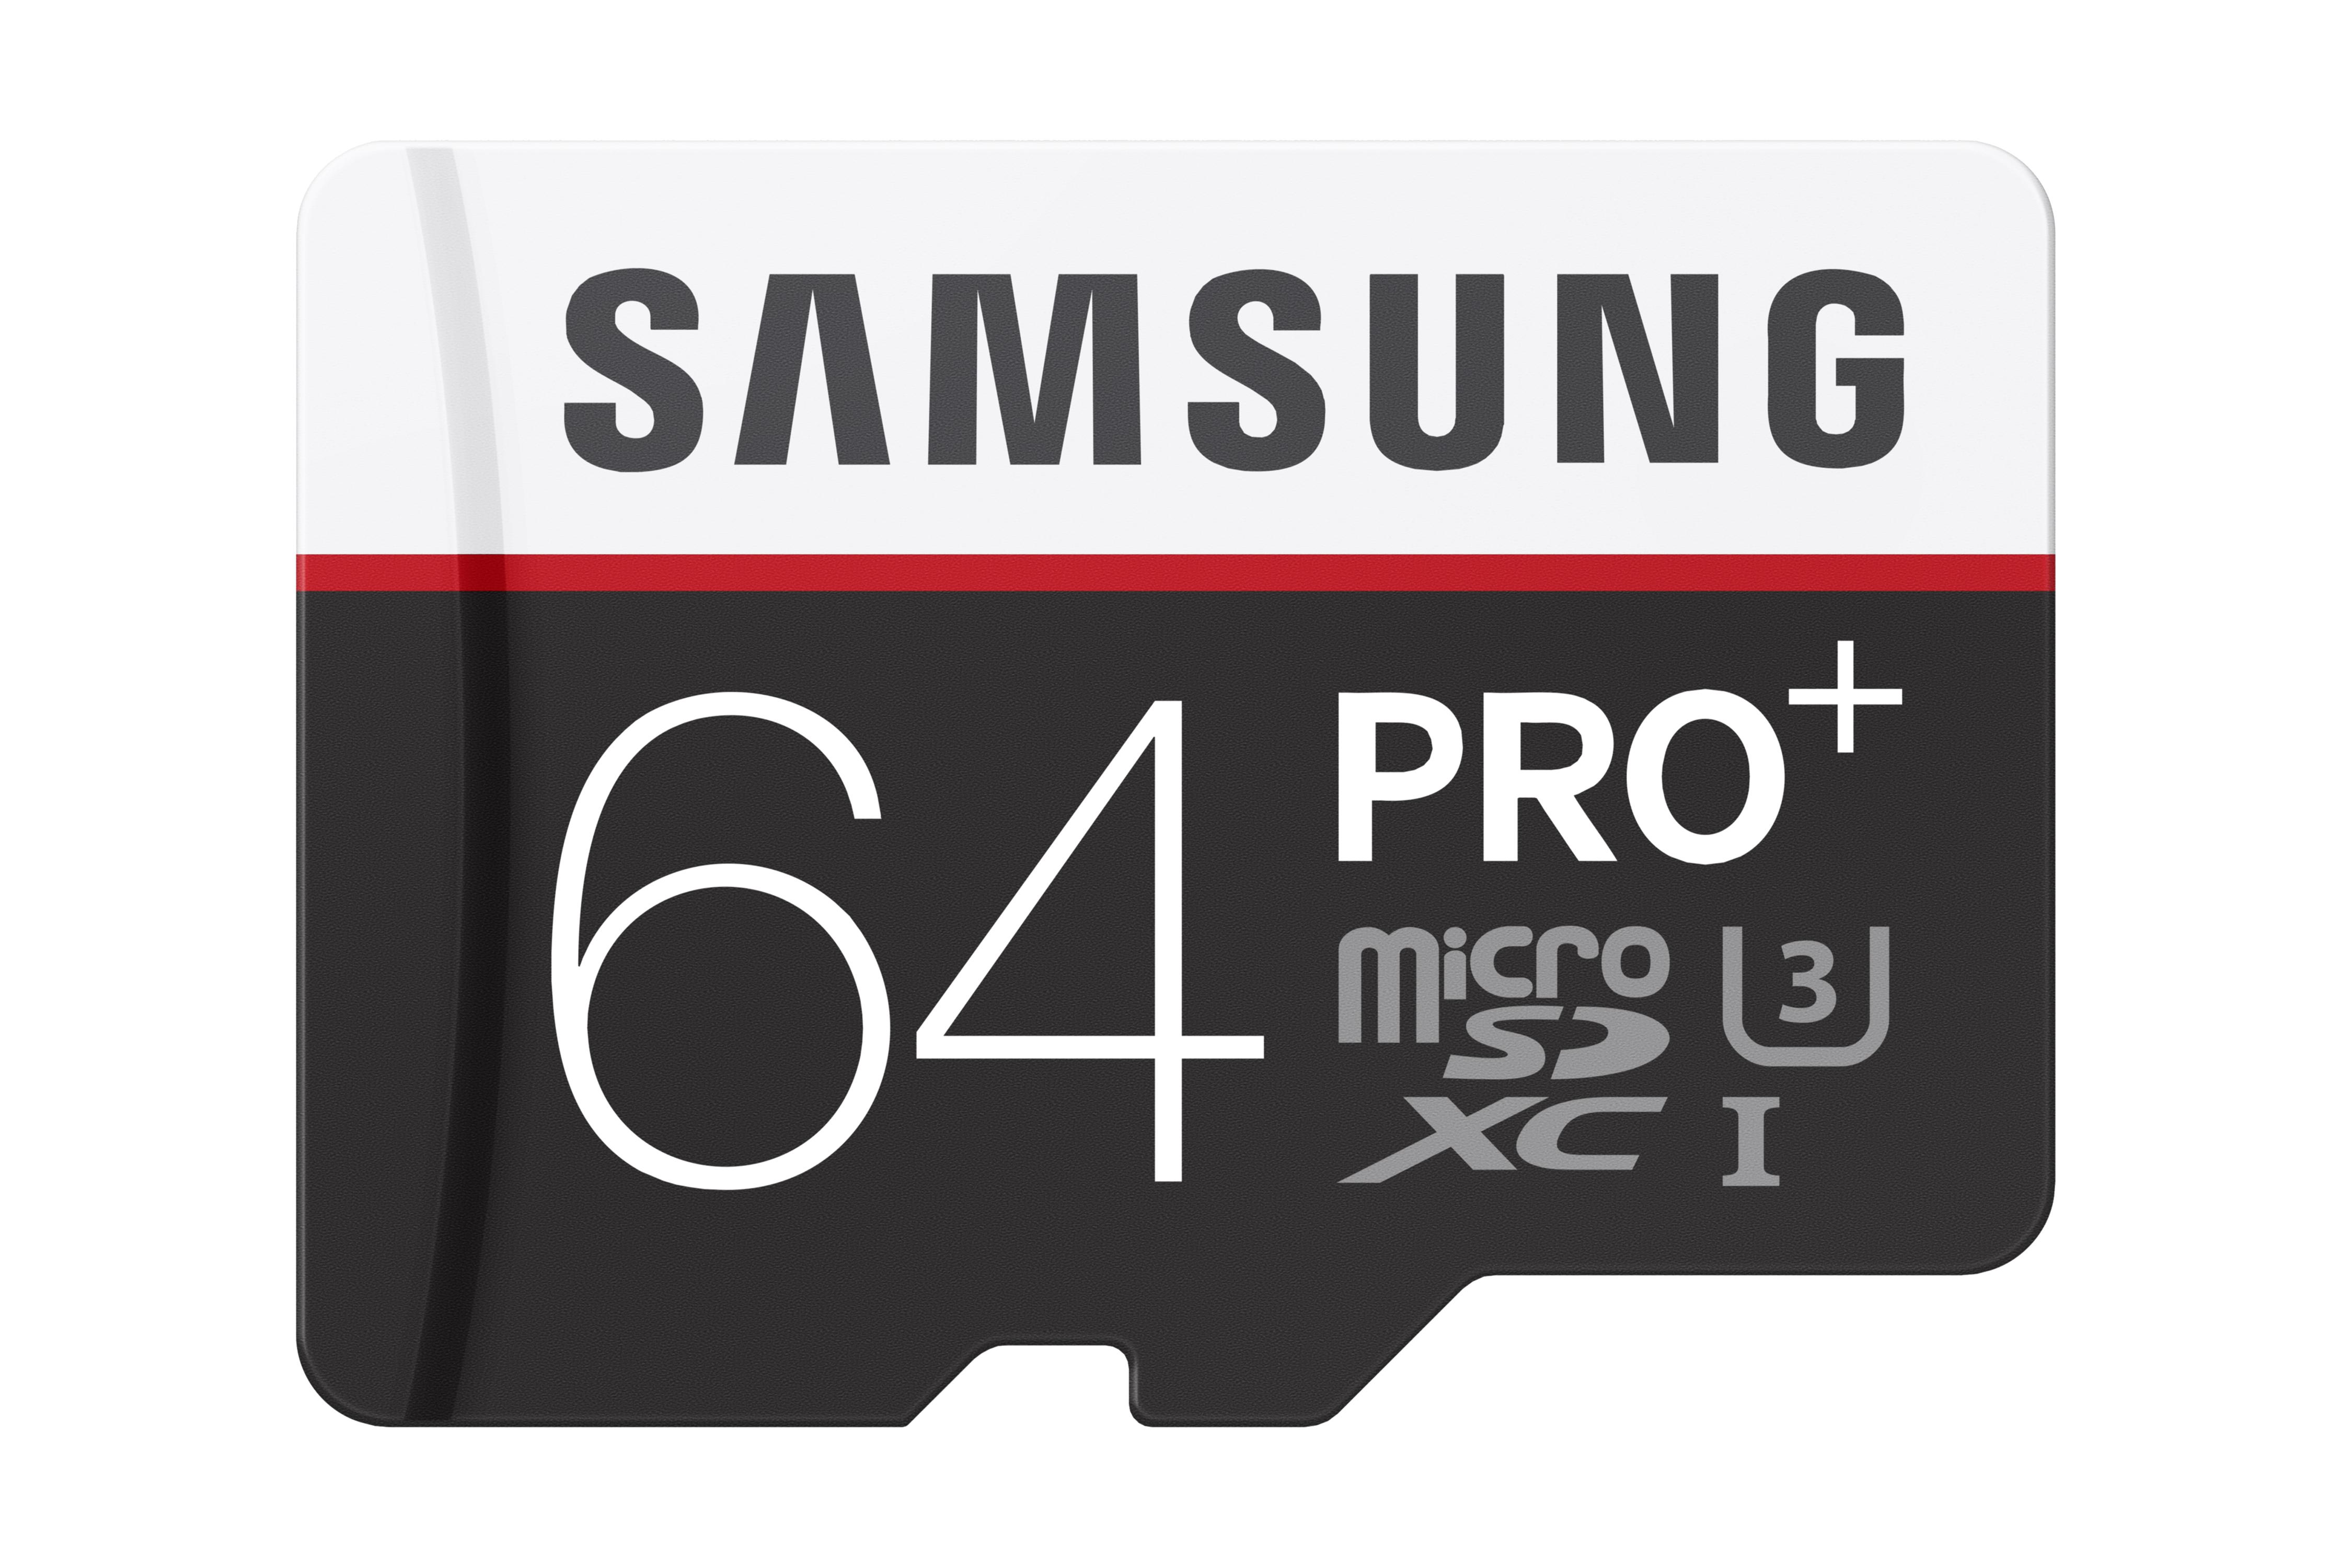 Paměťová karta Samsung 64GB Micro SDHC class10, 95MB/s s adaptérem